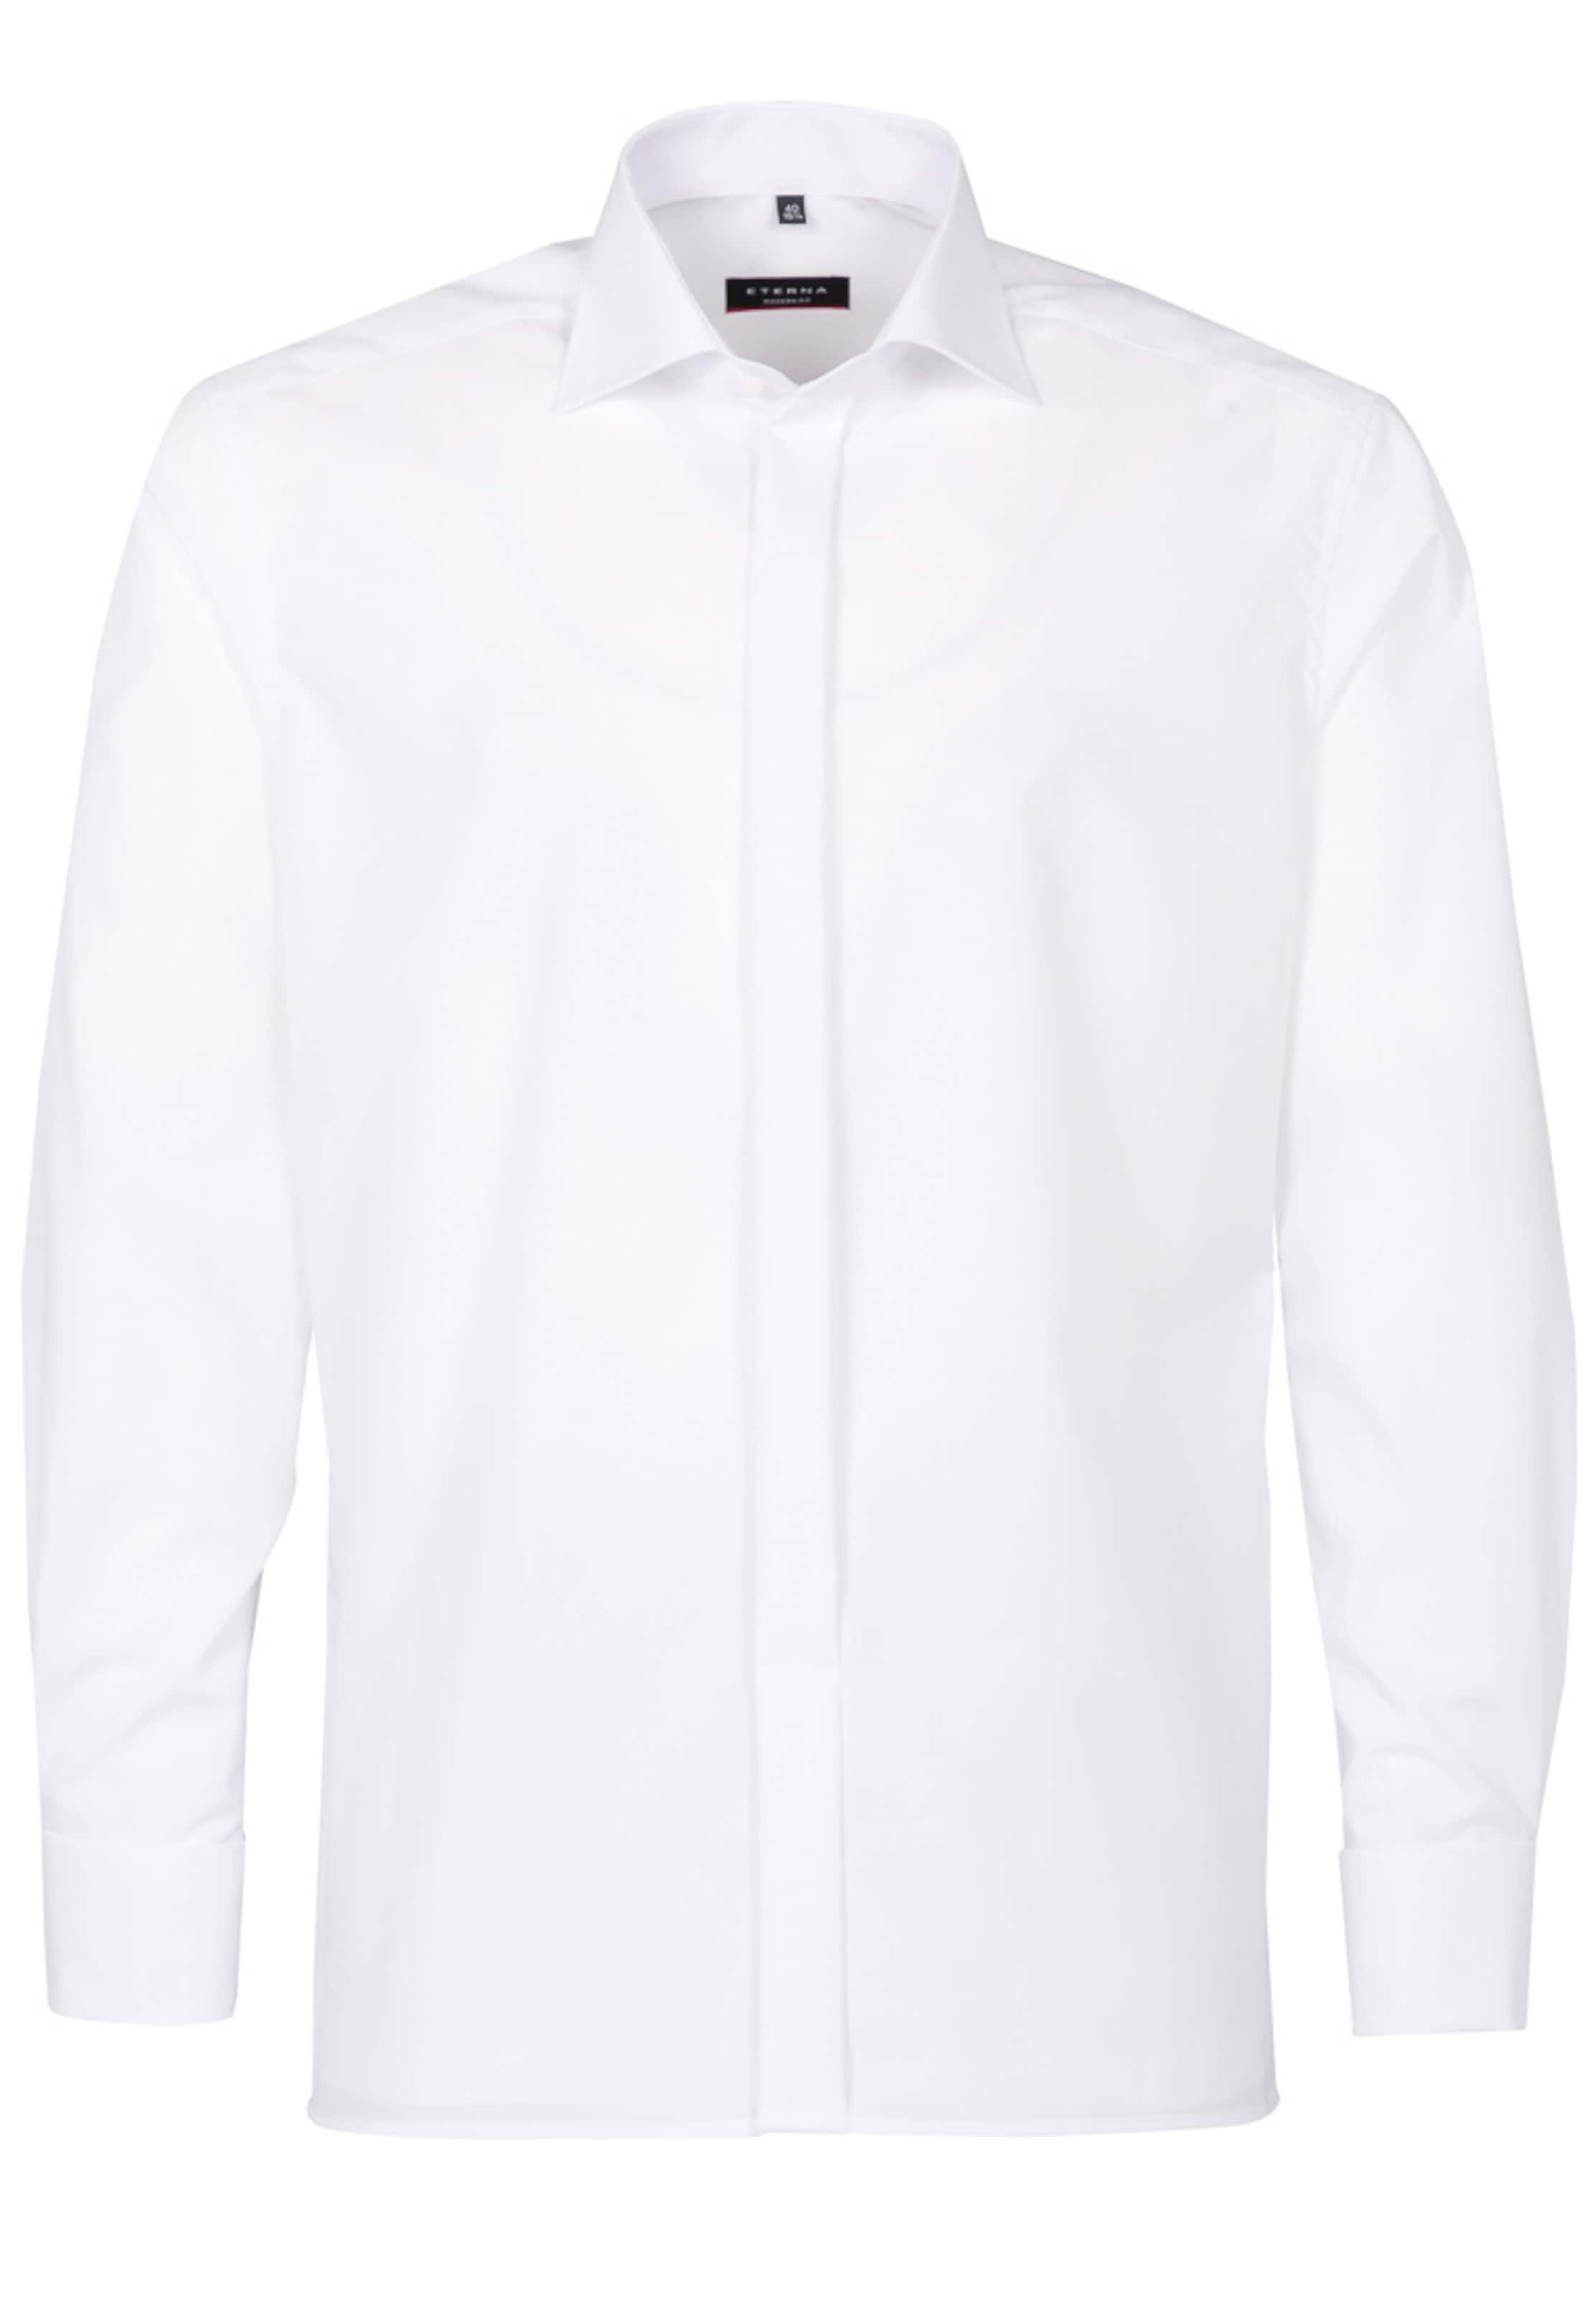 Modern Langarm Fit In Hemd Weiß Eterna vwm8nON0